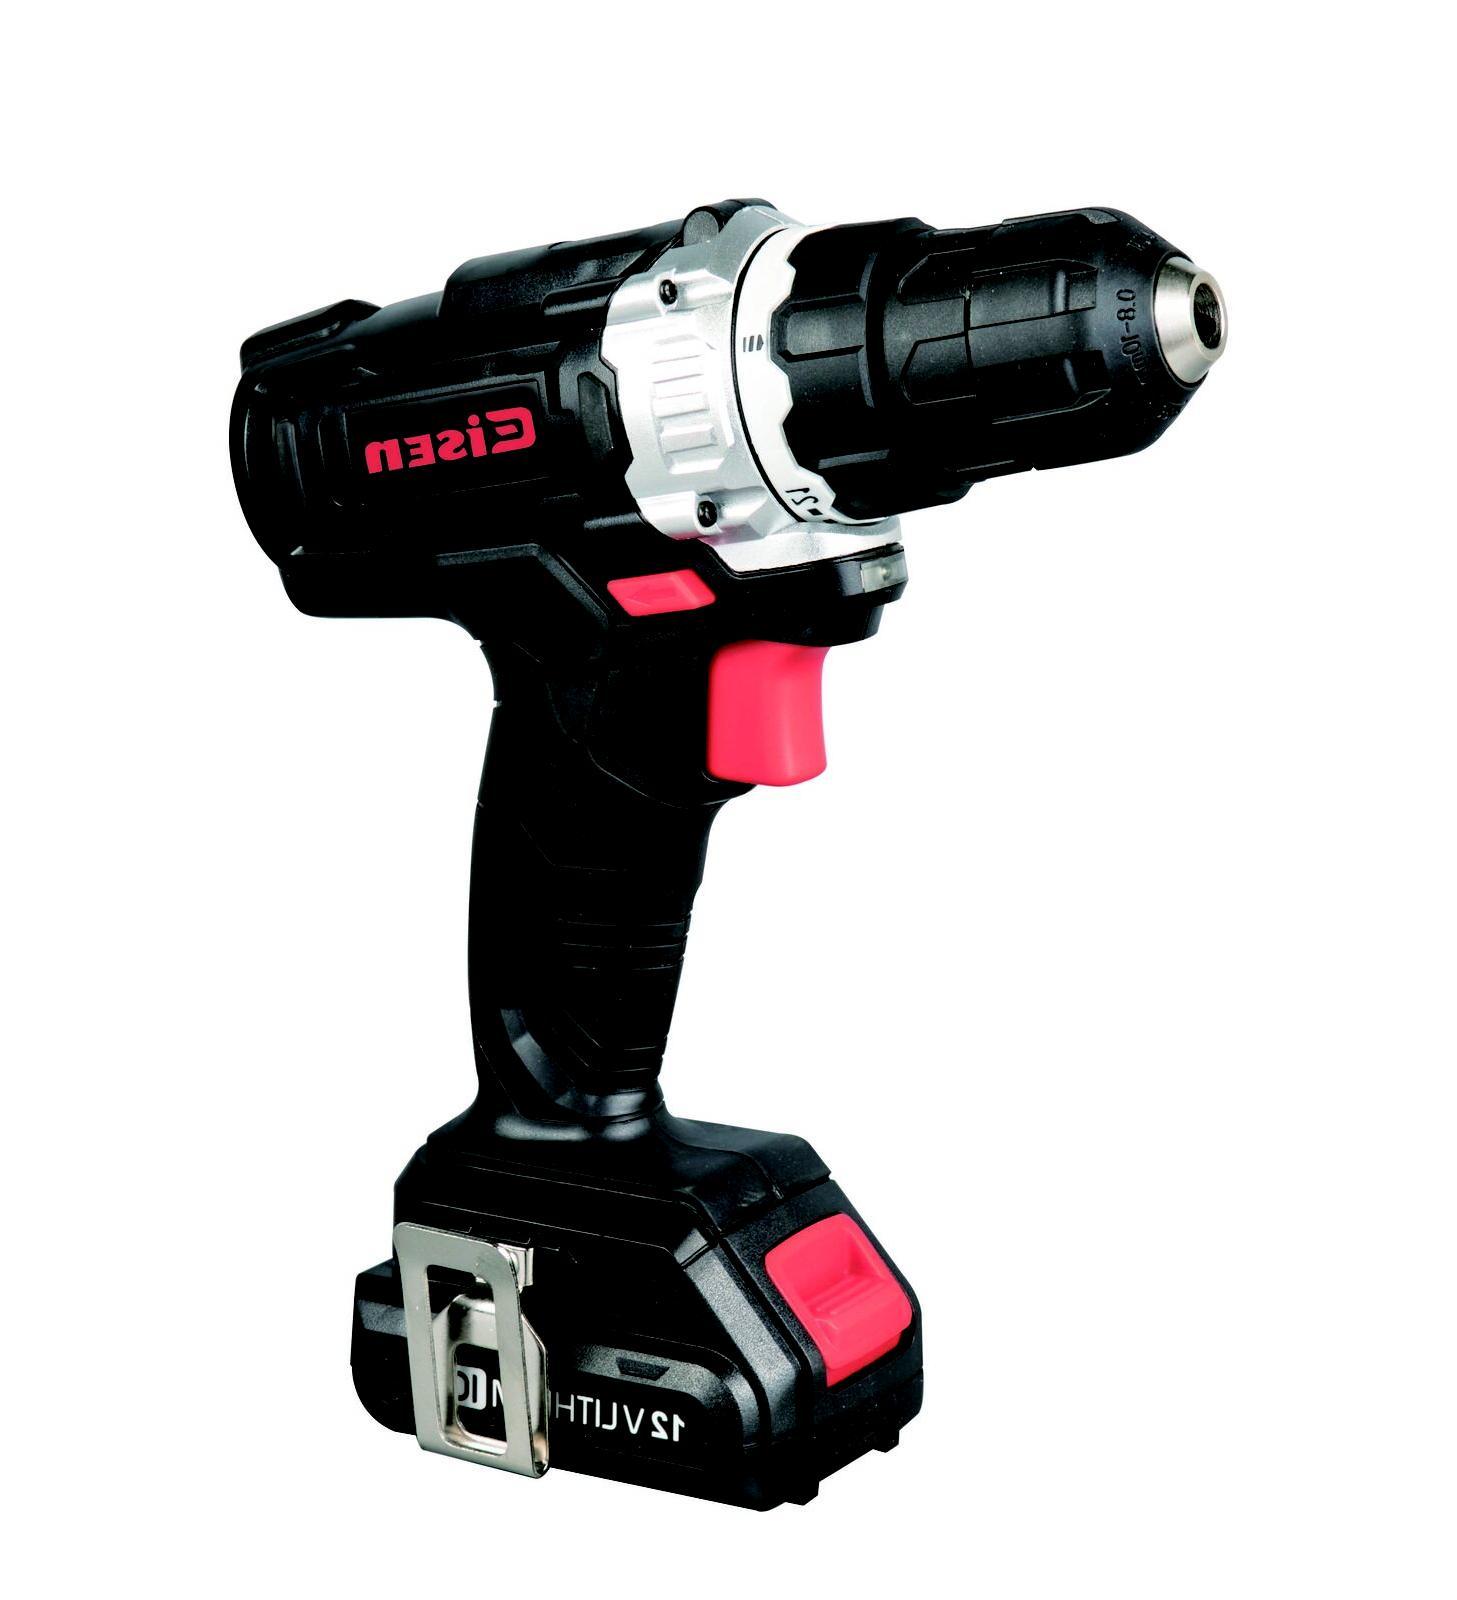 12V Drill, 21+1 Drill With LED 50pcs Tools